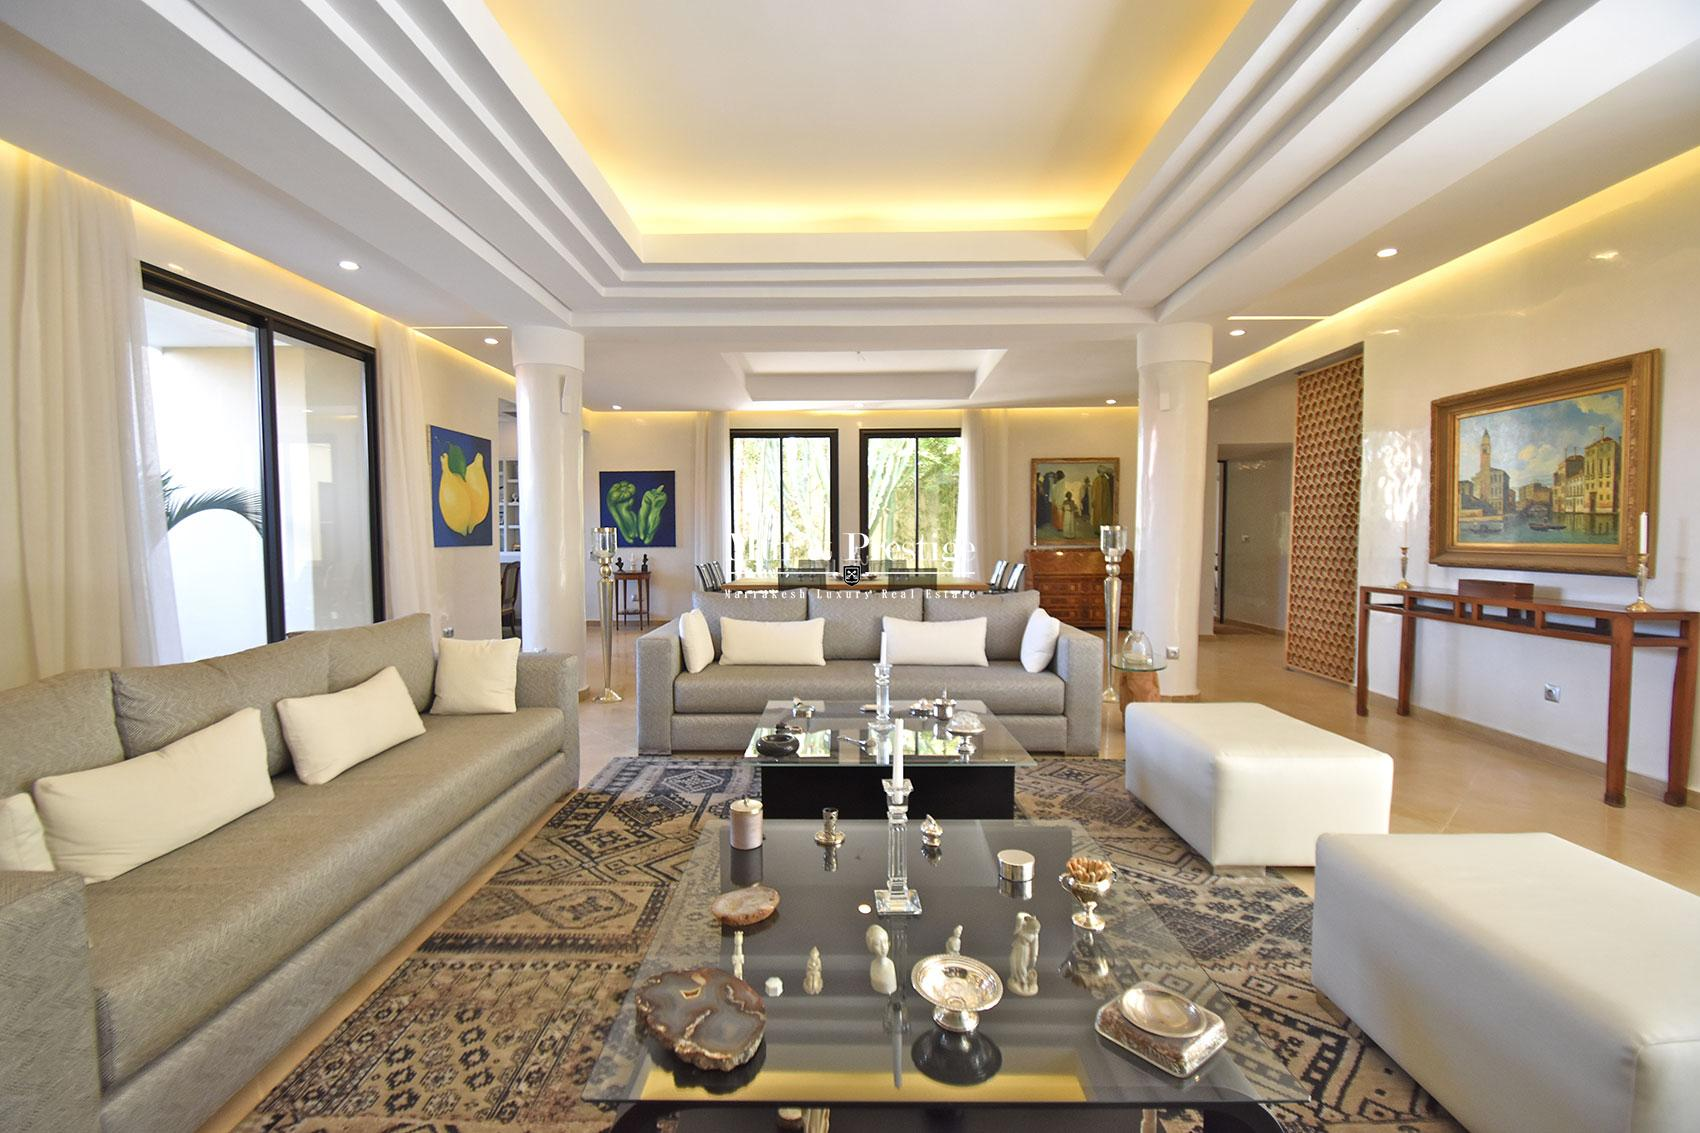 Propriete de prestige a vendre a Marrakech